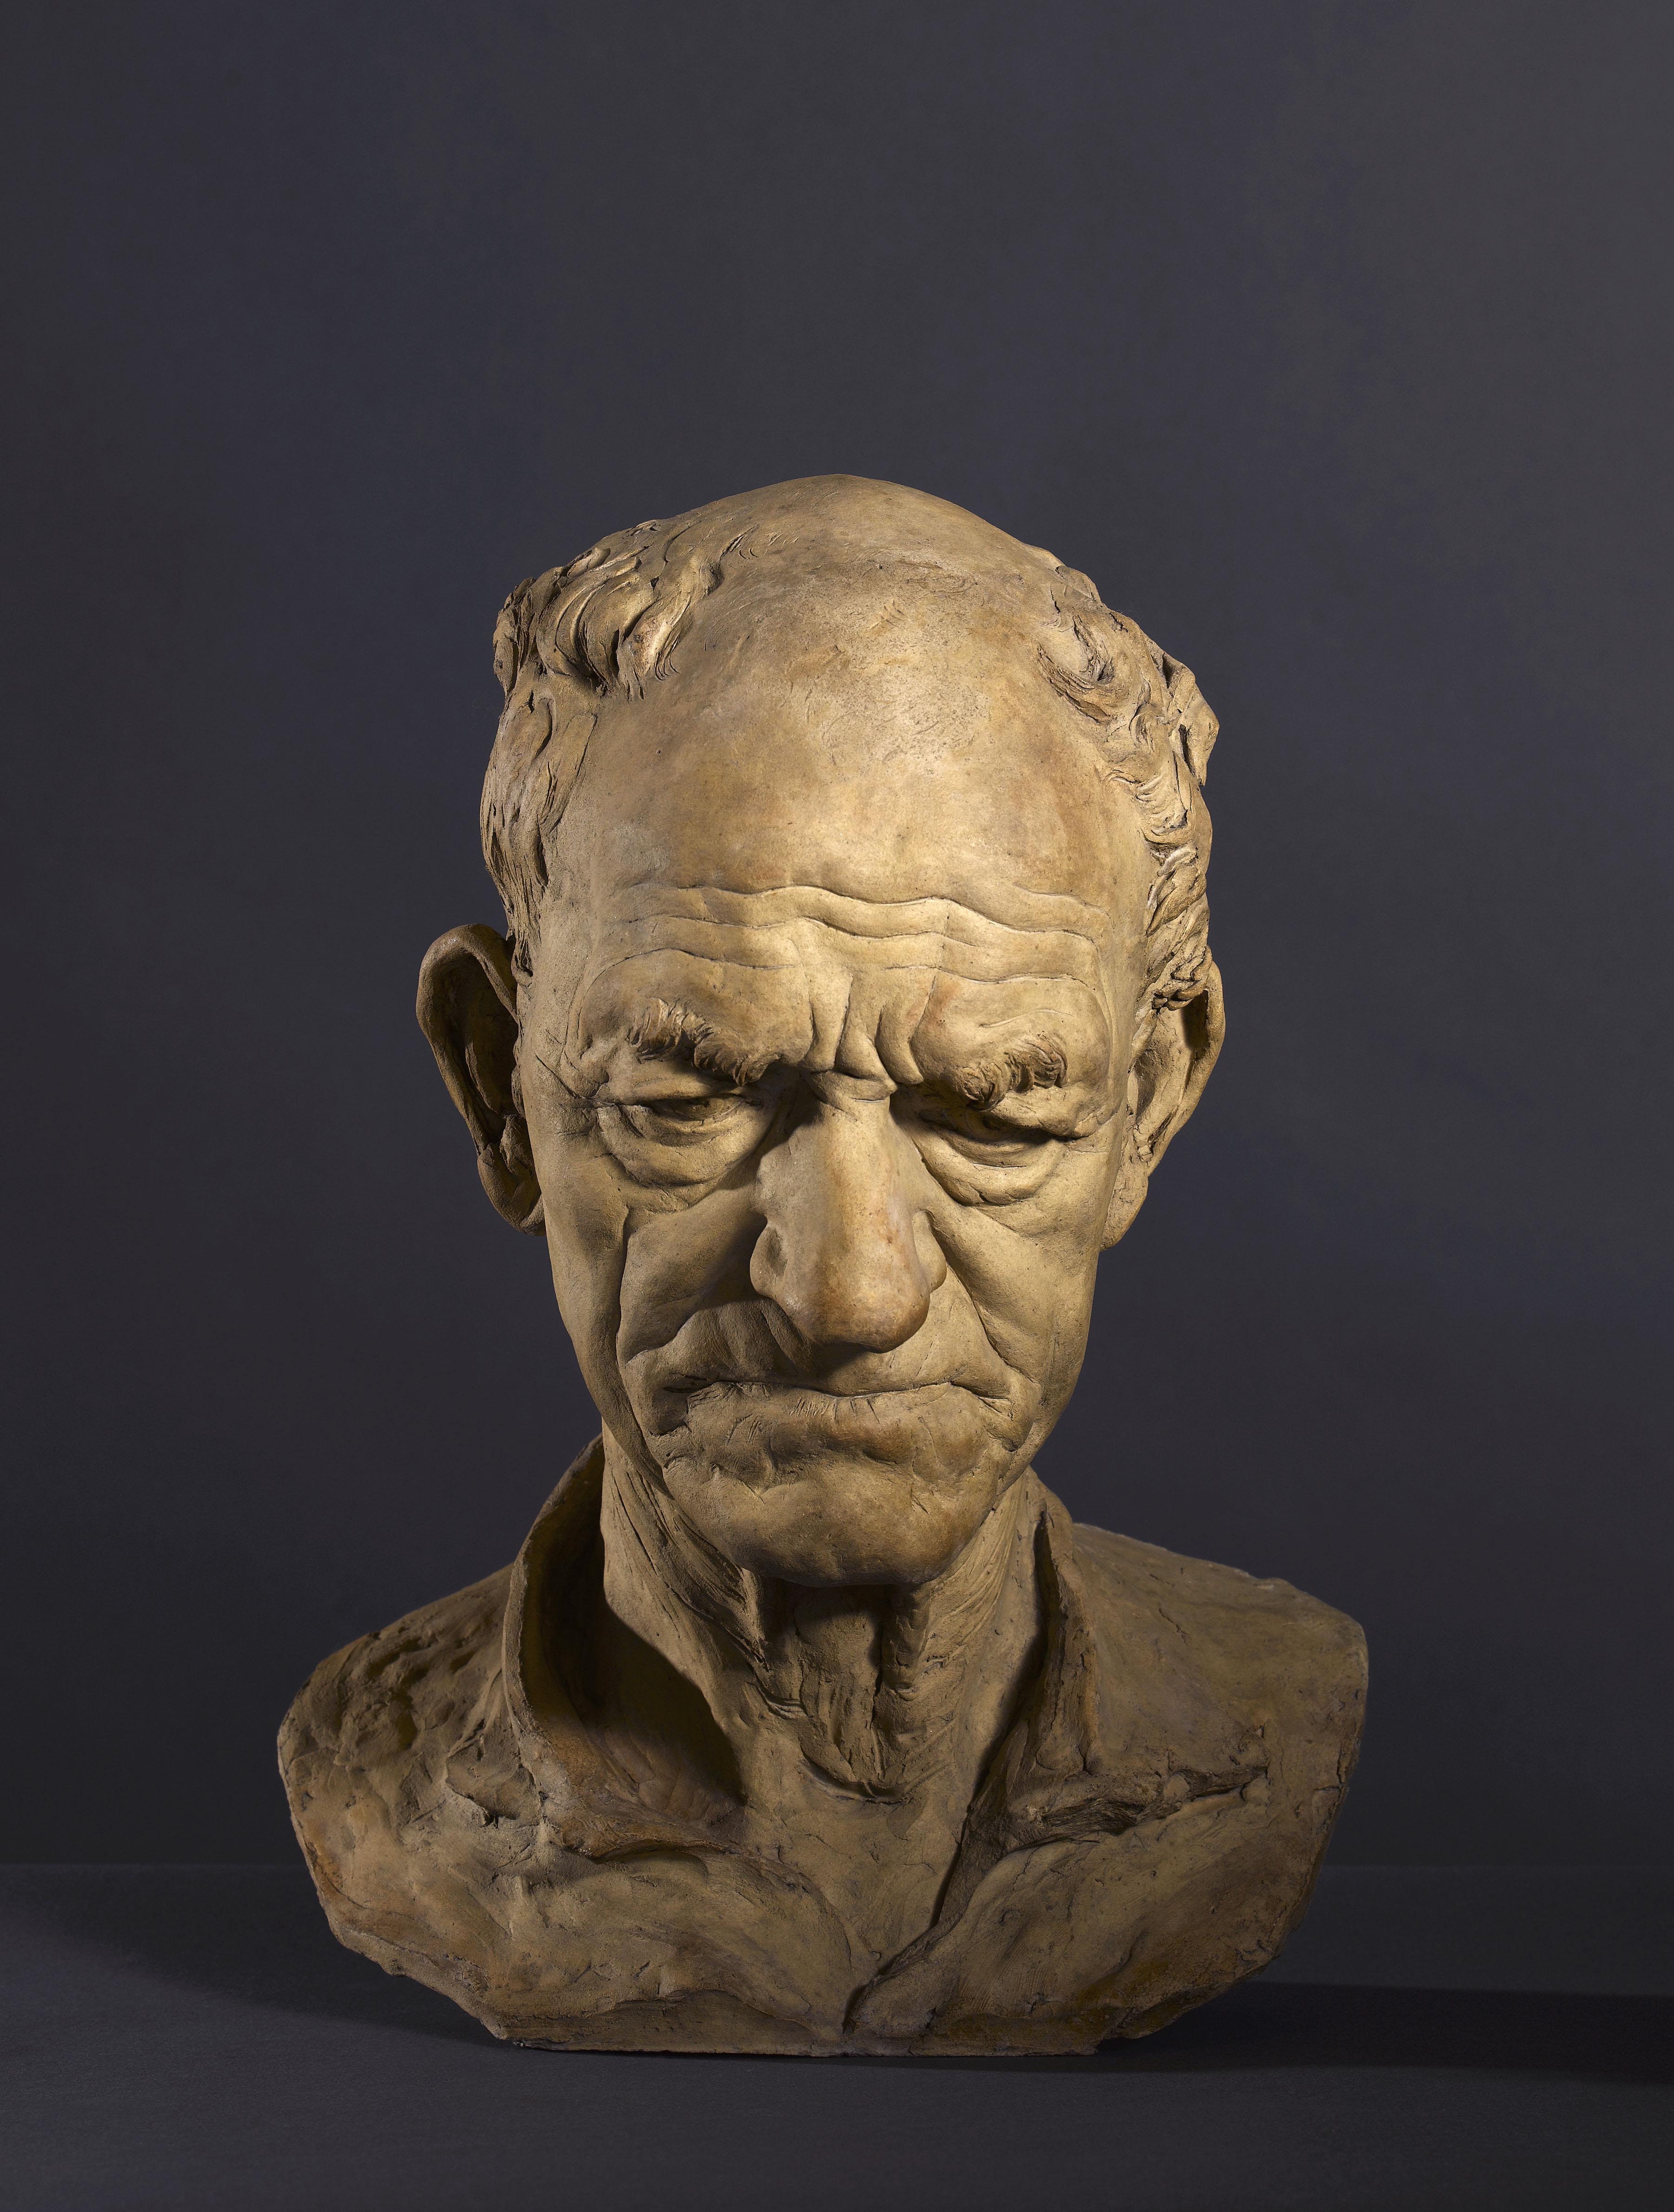 Aimé Jules Dalou - Peasant's head